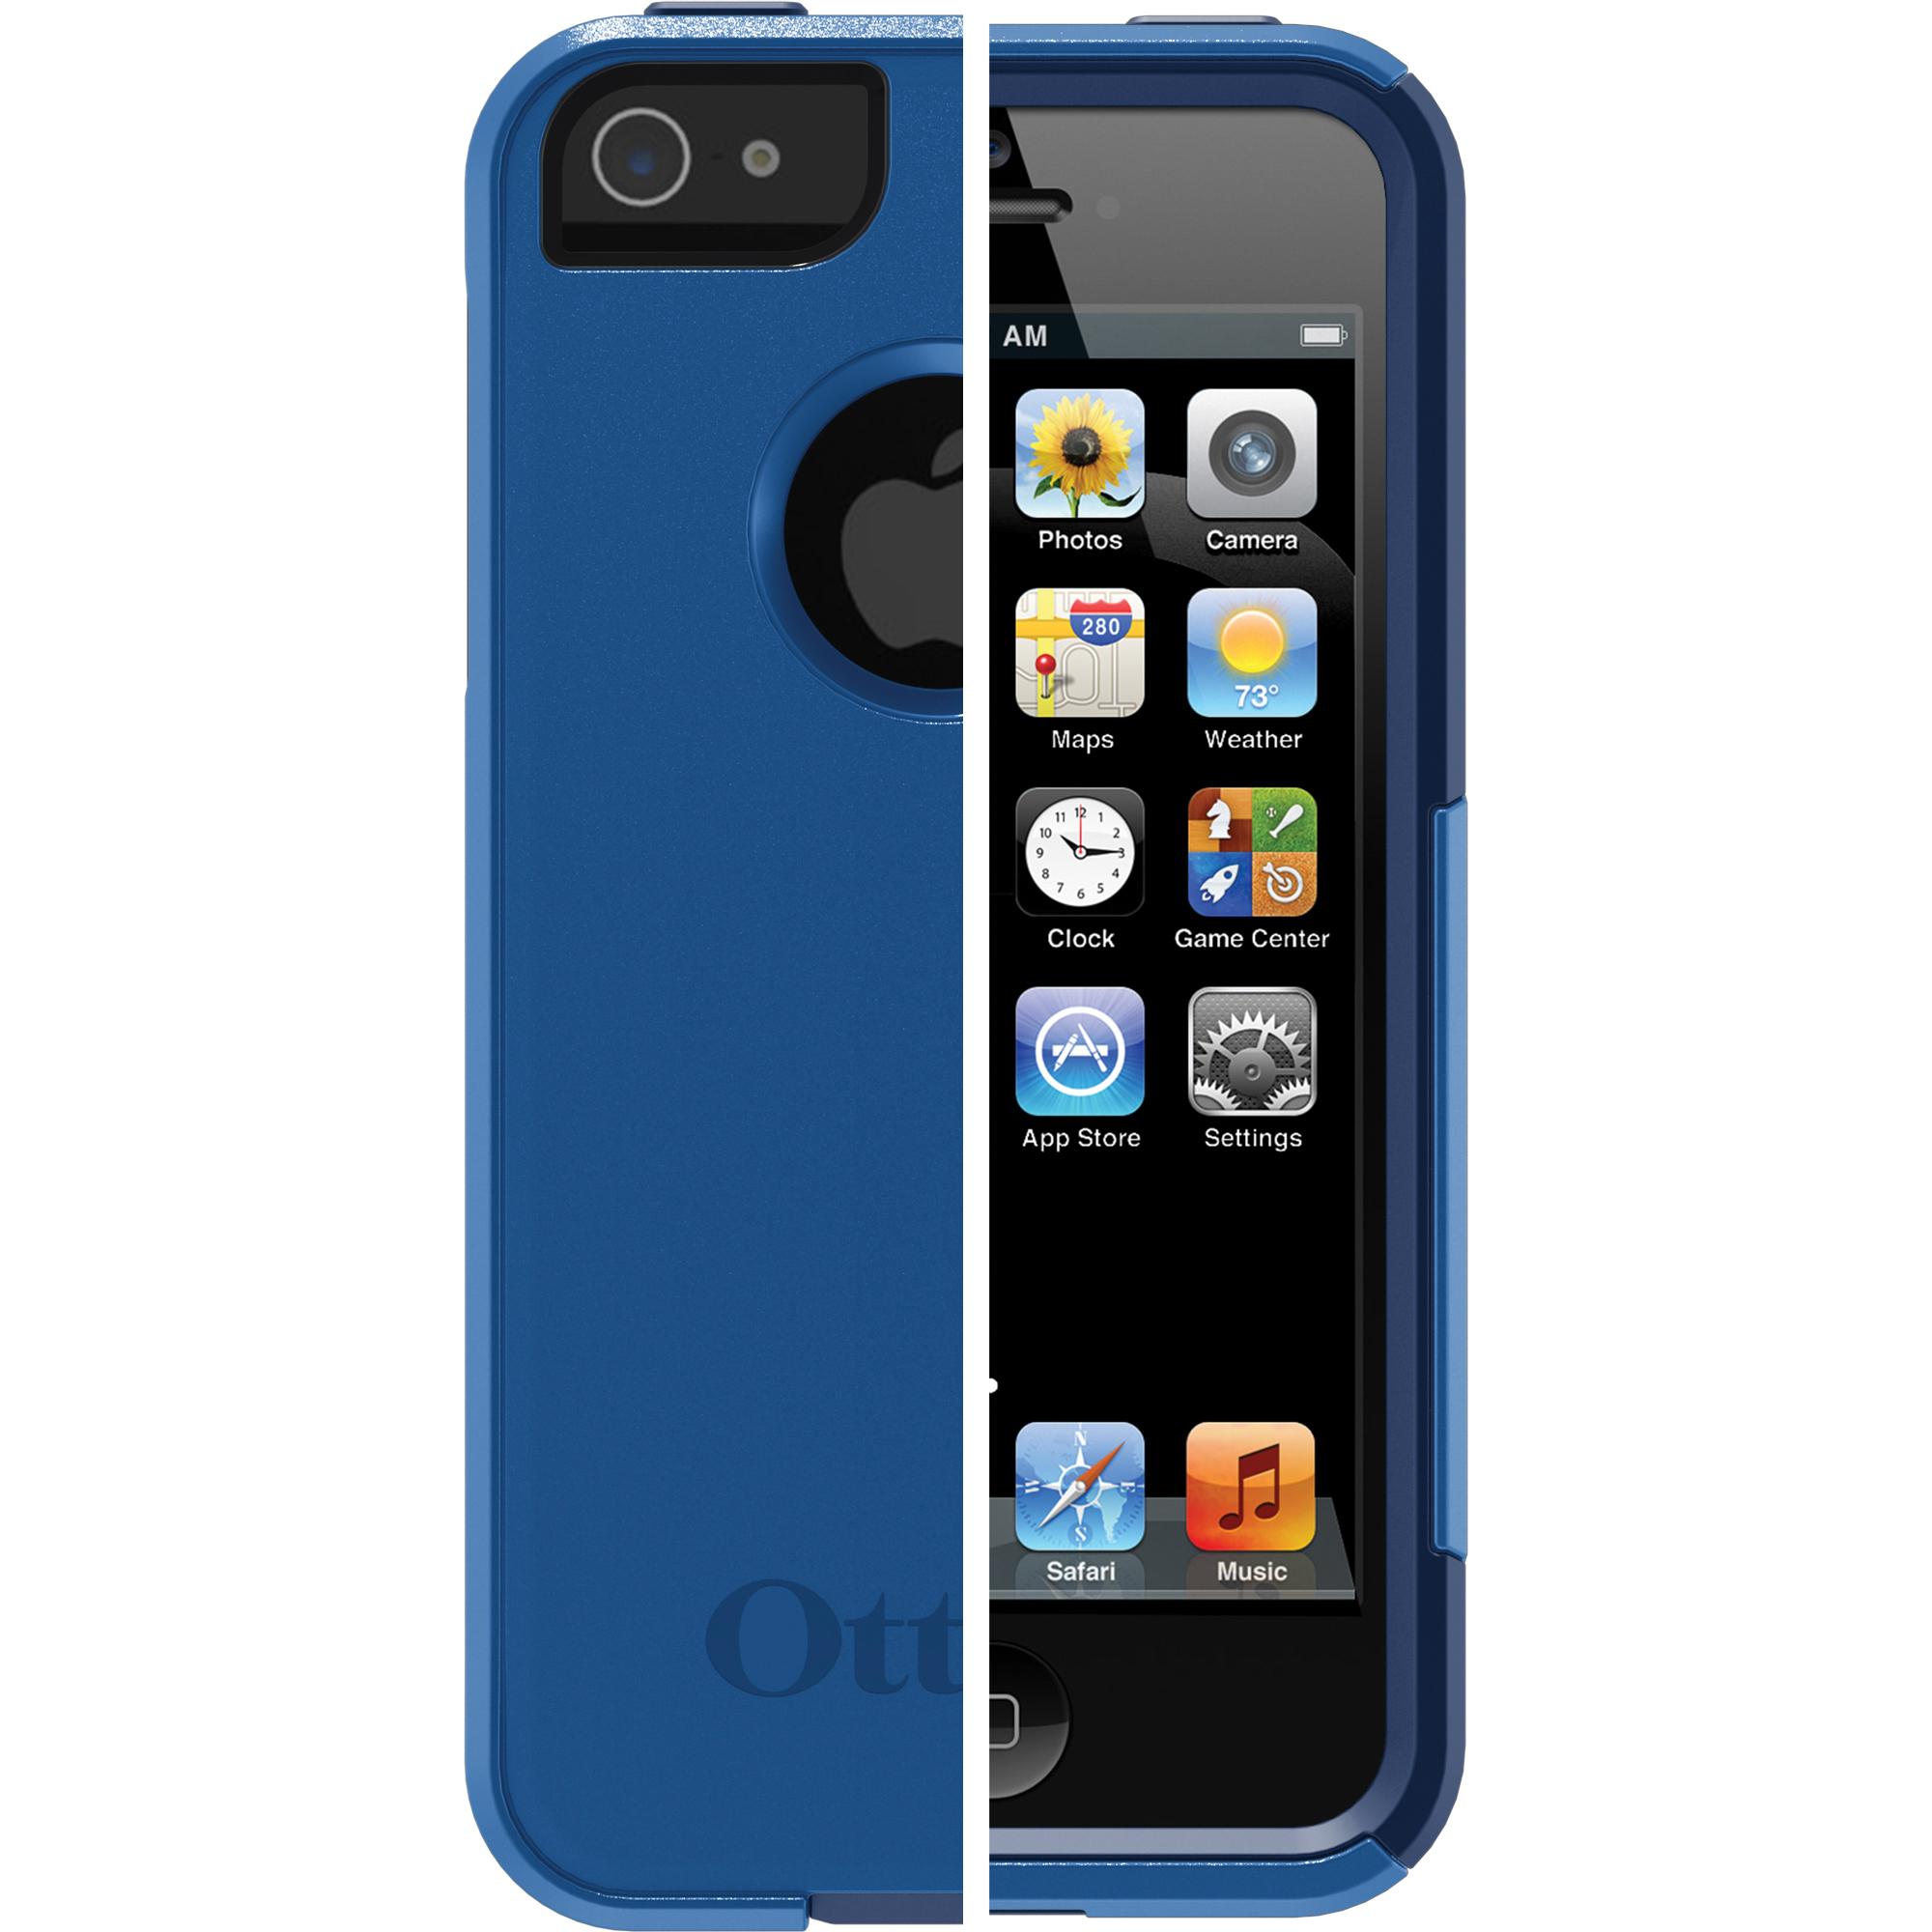 iPhone 5/5s/SE Case Commuter Series